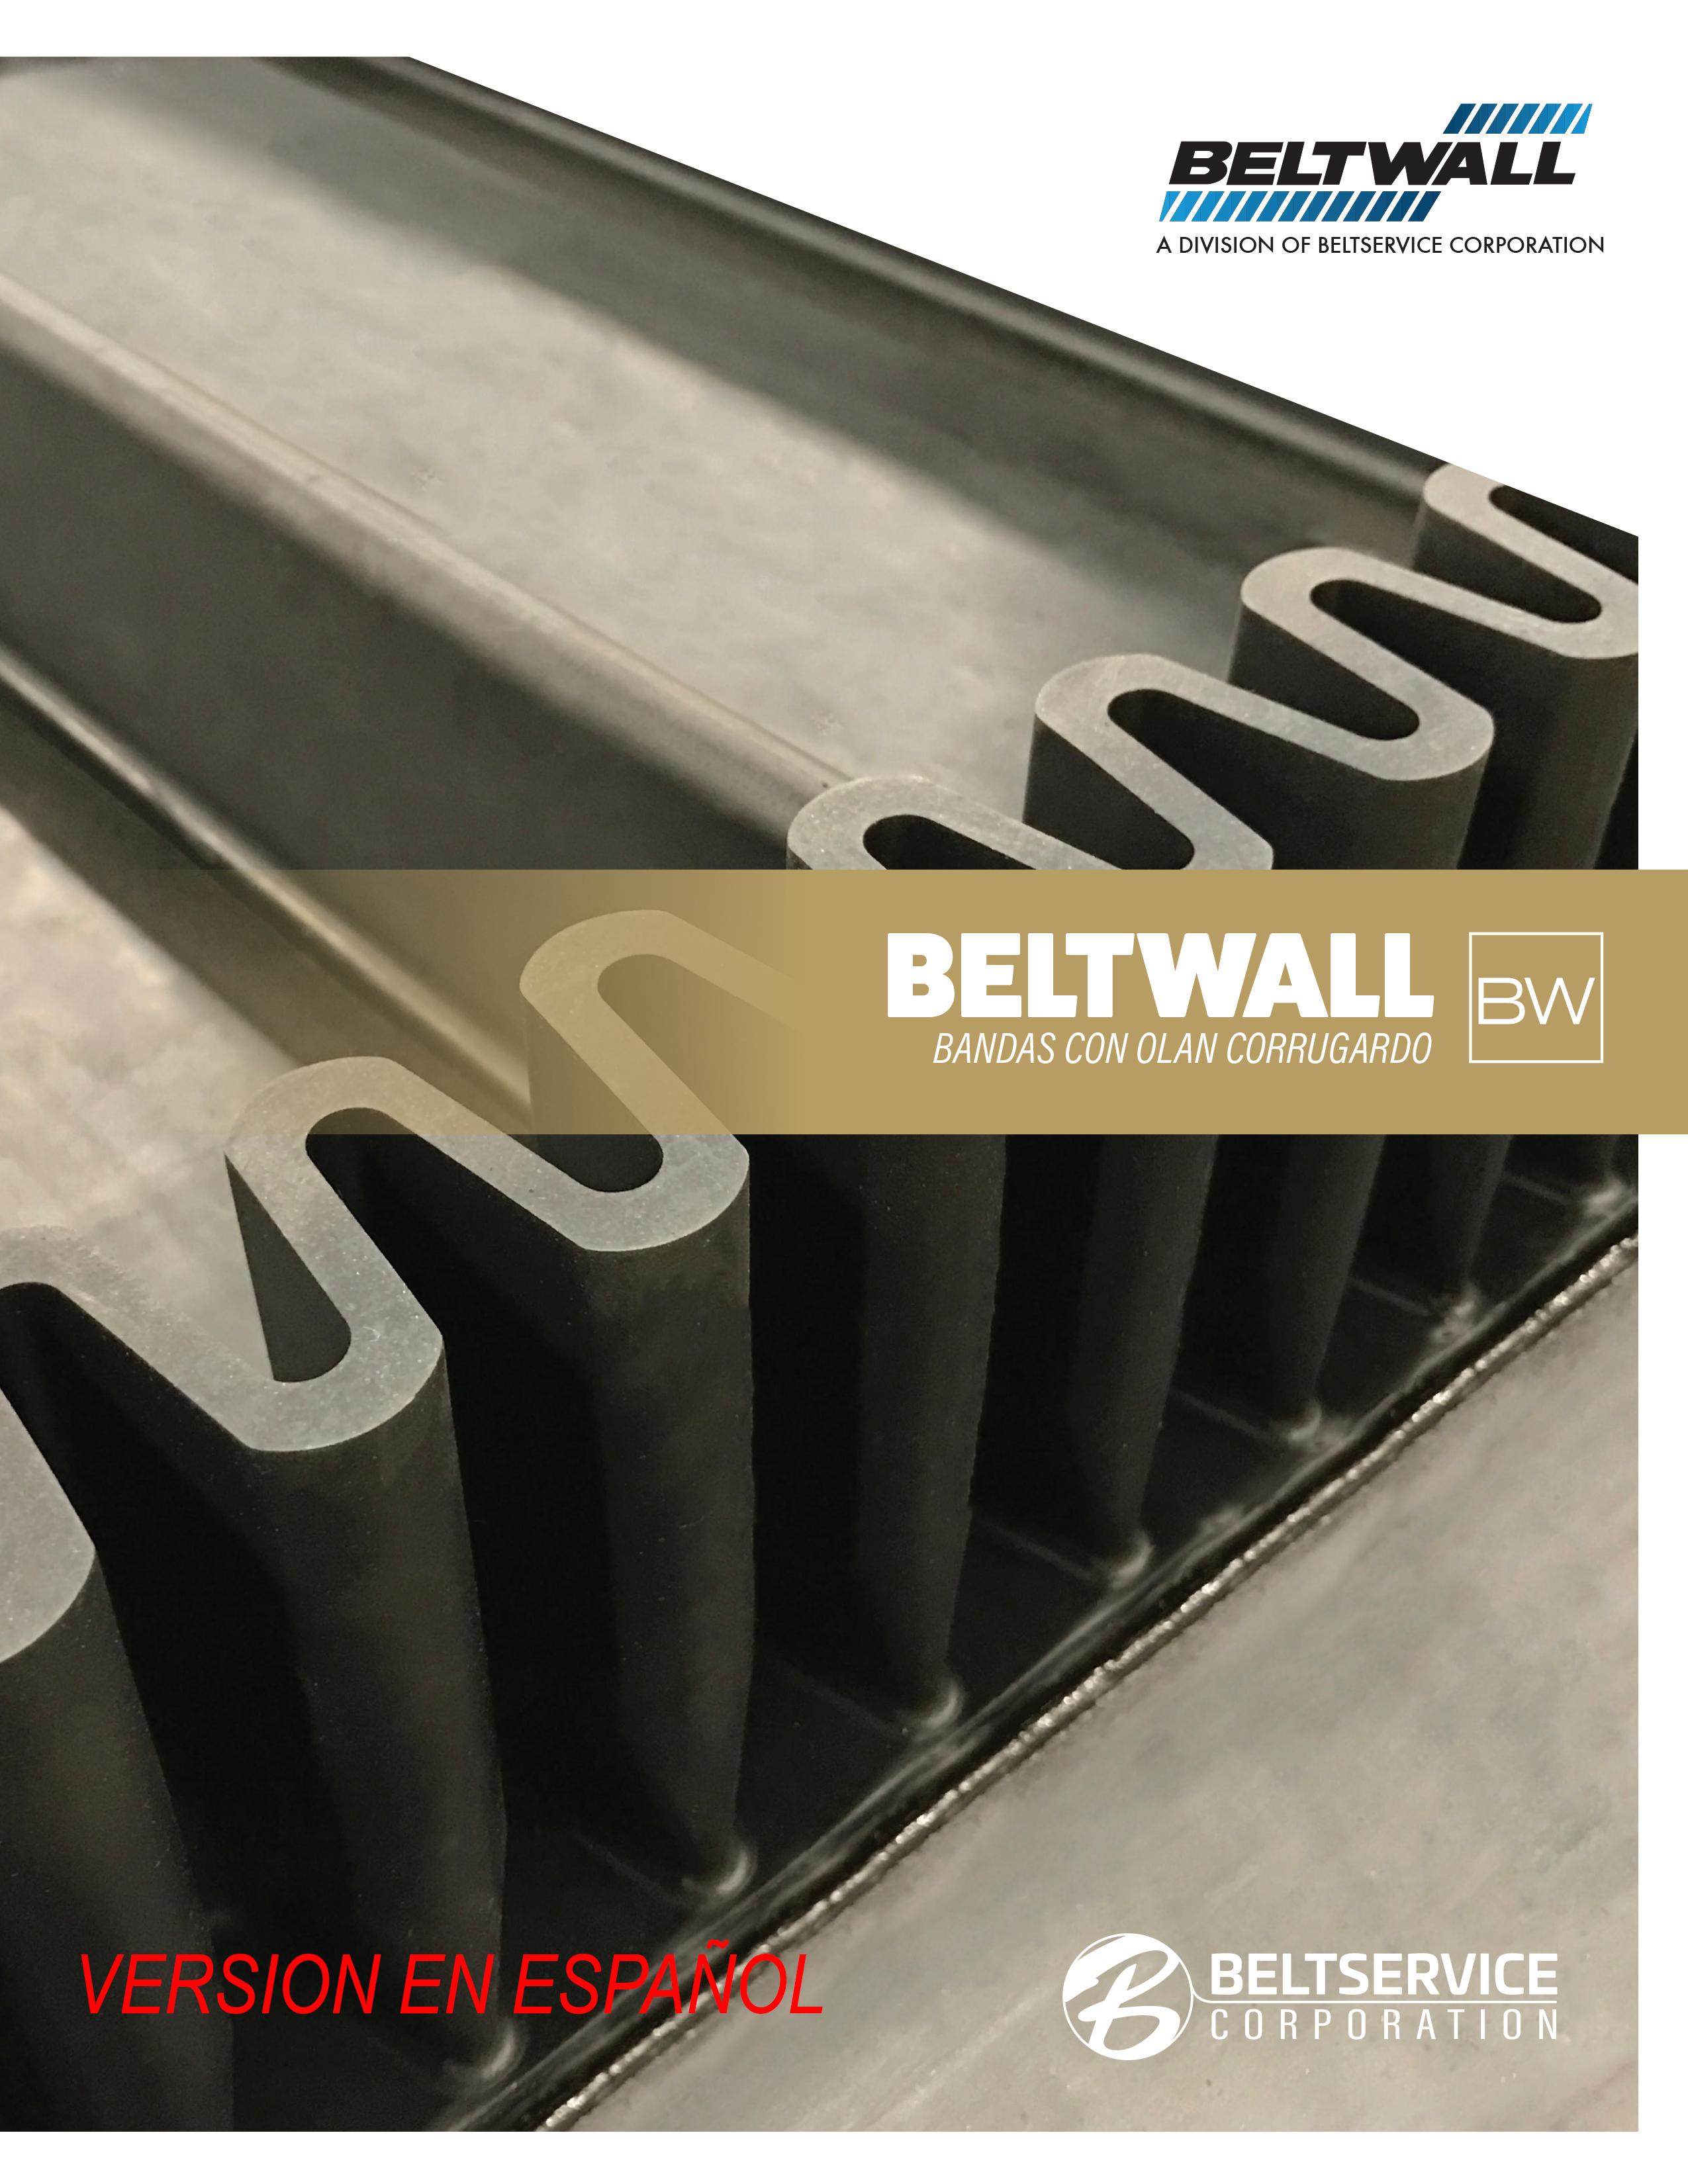 Beltwall - Spanish Version